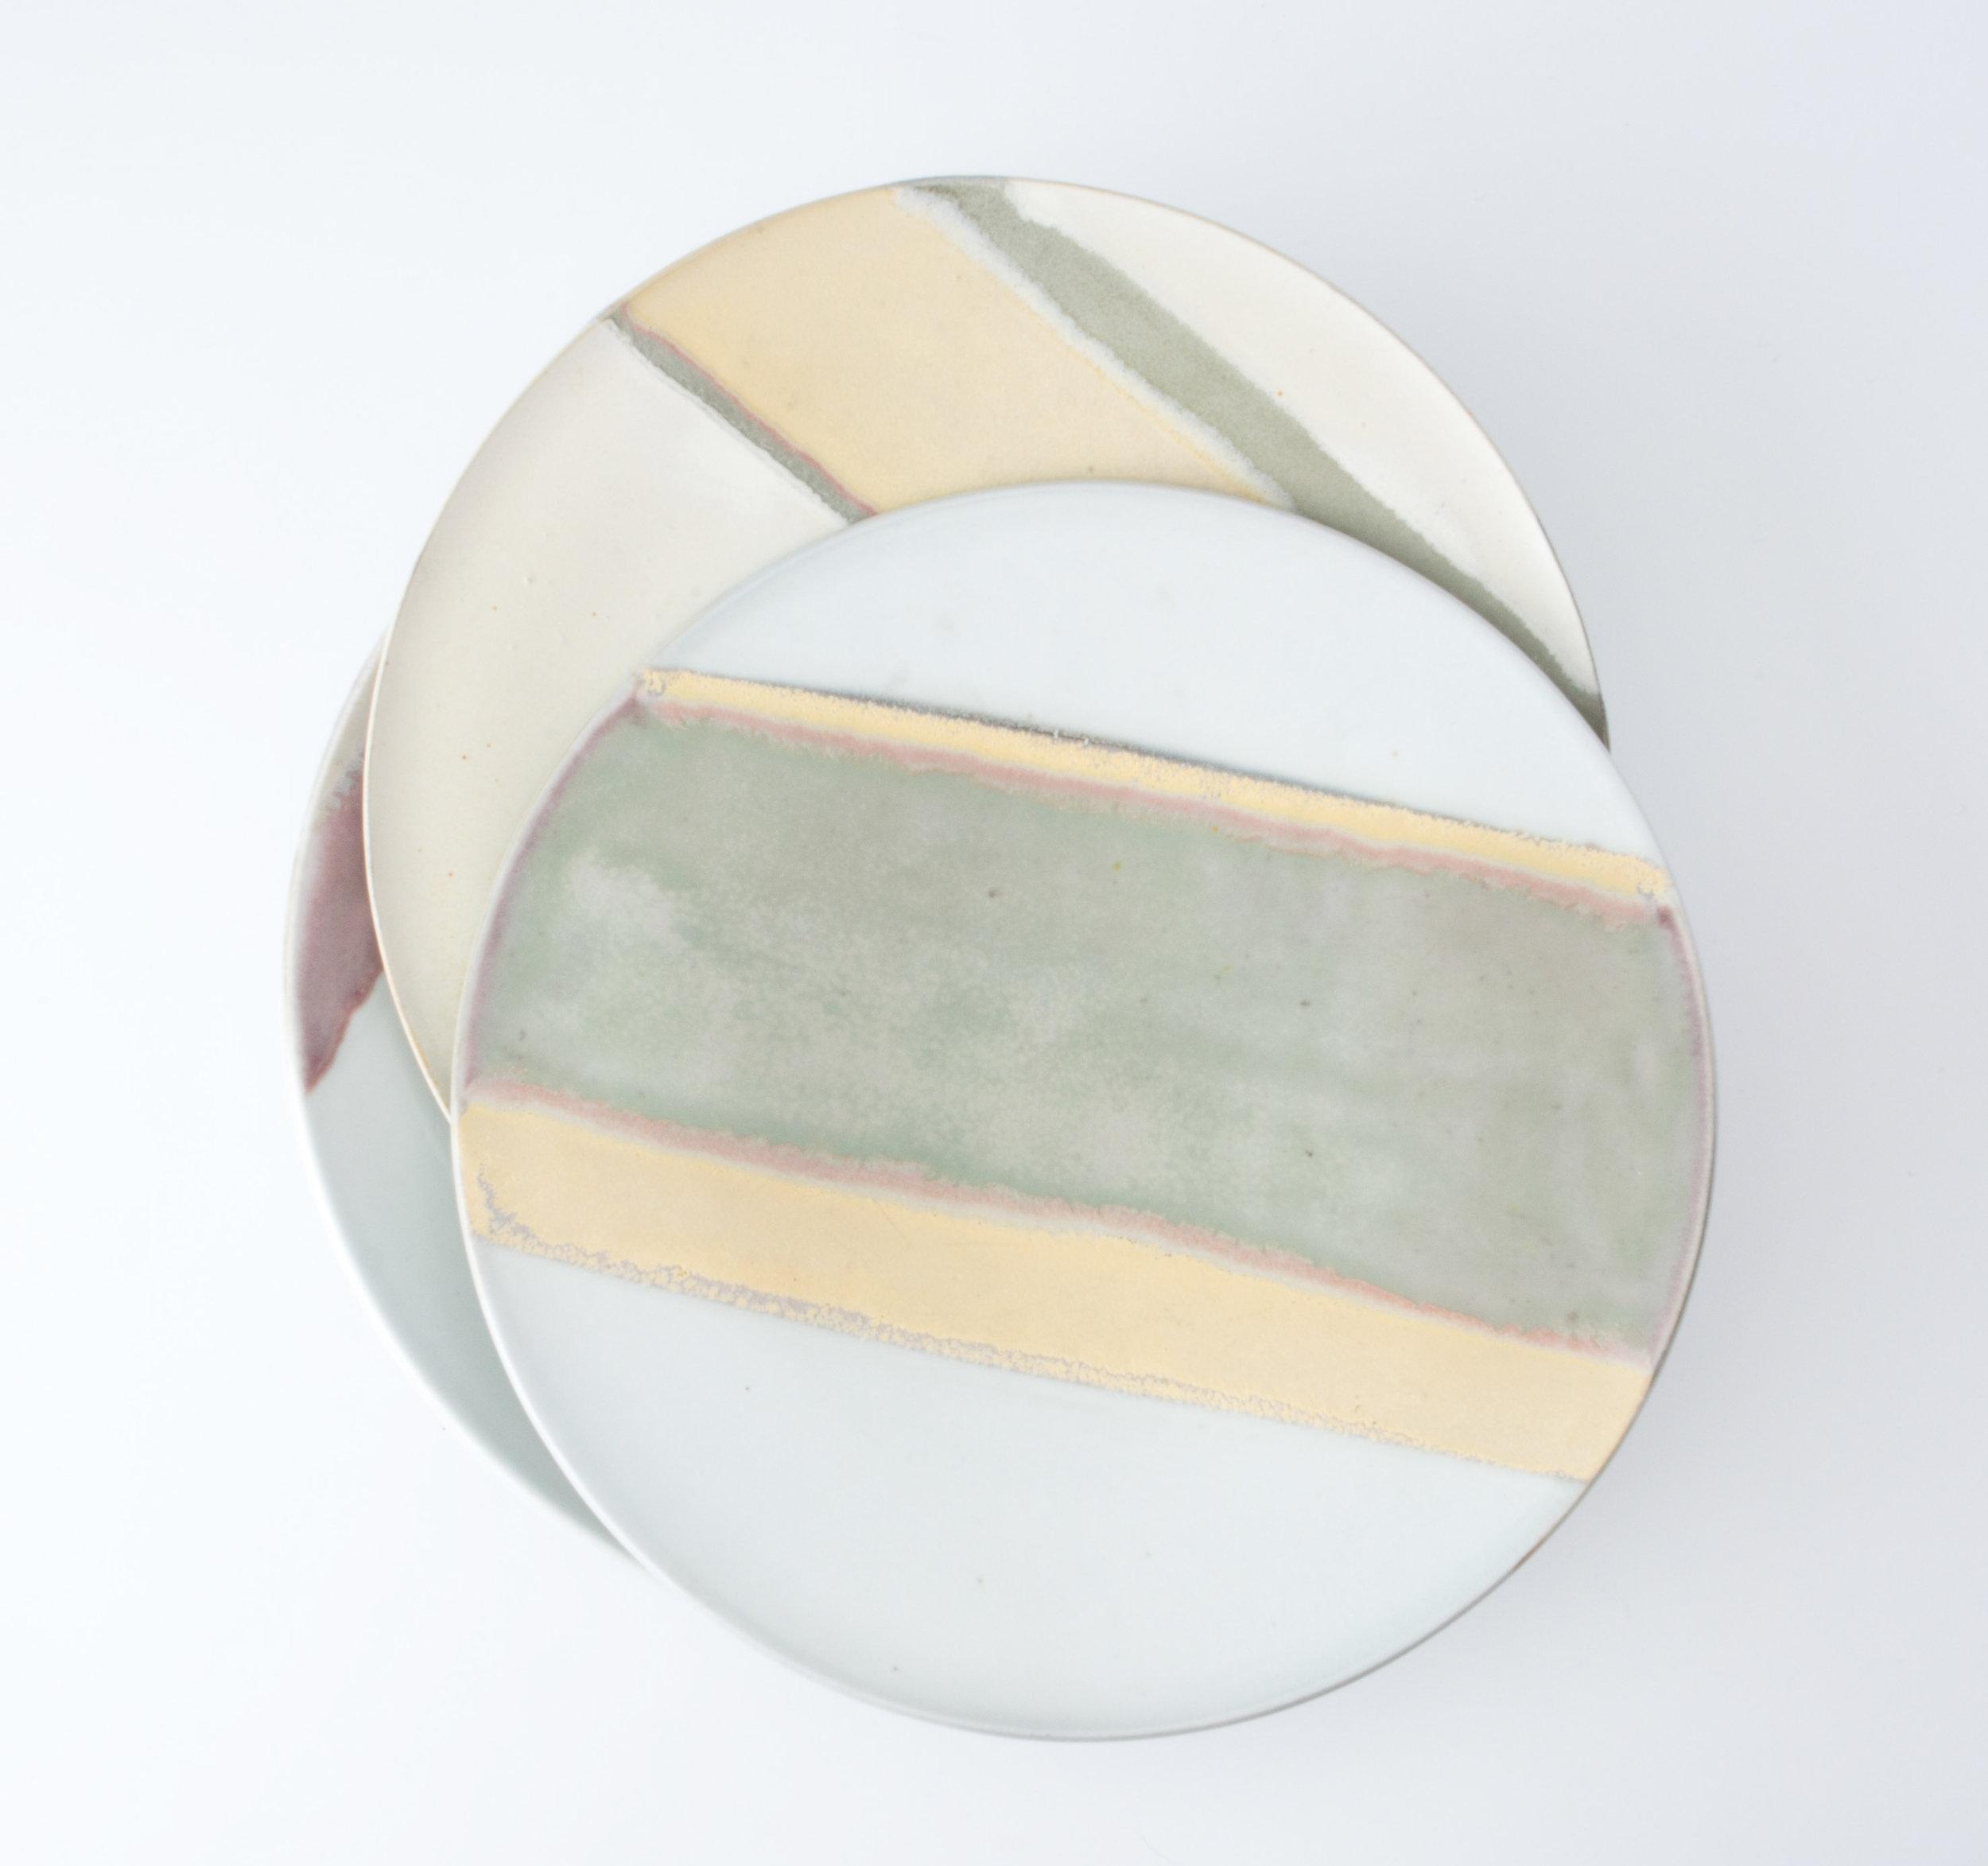 "Canvas Plates  Cone 10 Reduction Porcelain  Top Plate 9.75"" W x 2"" H  2016"